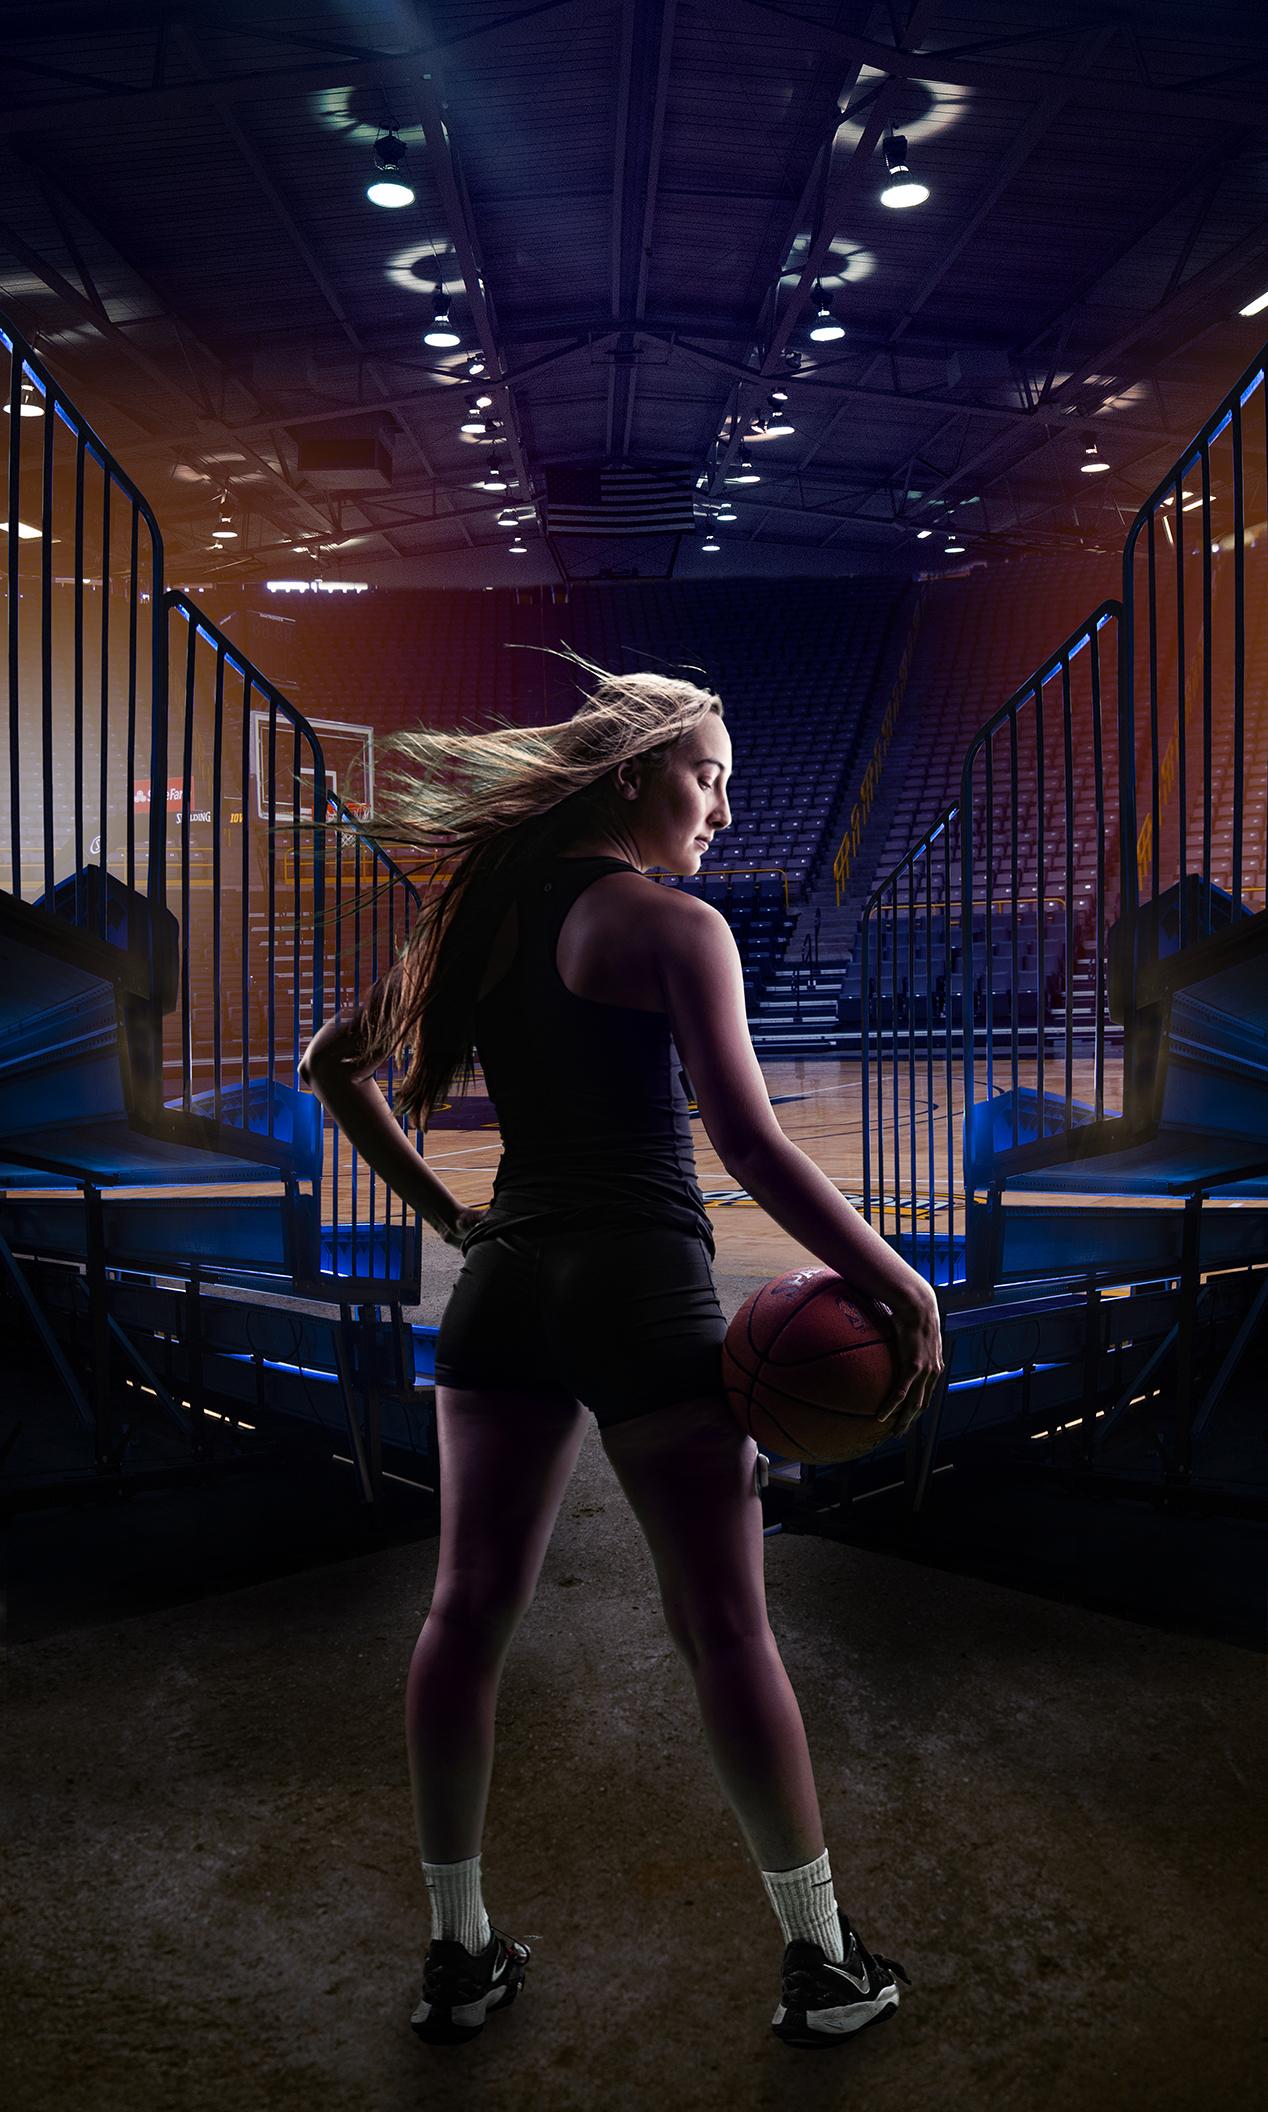 Basketball Stadium Composite@0,25x.jpg